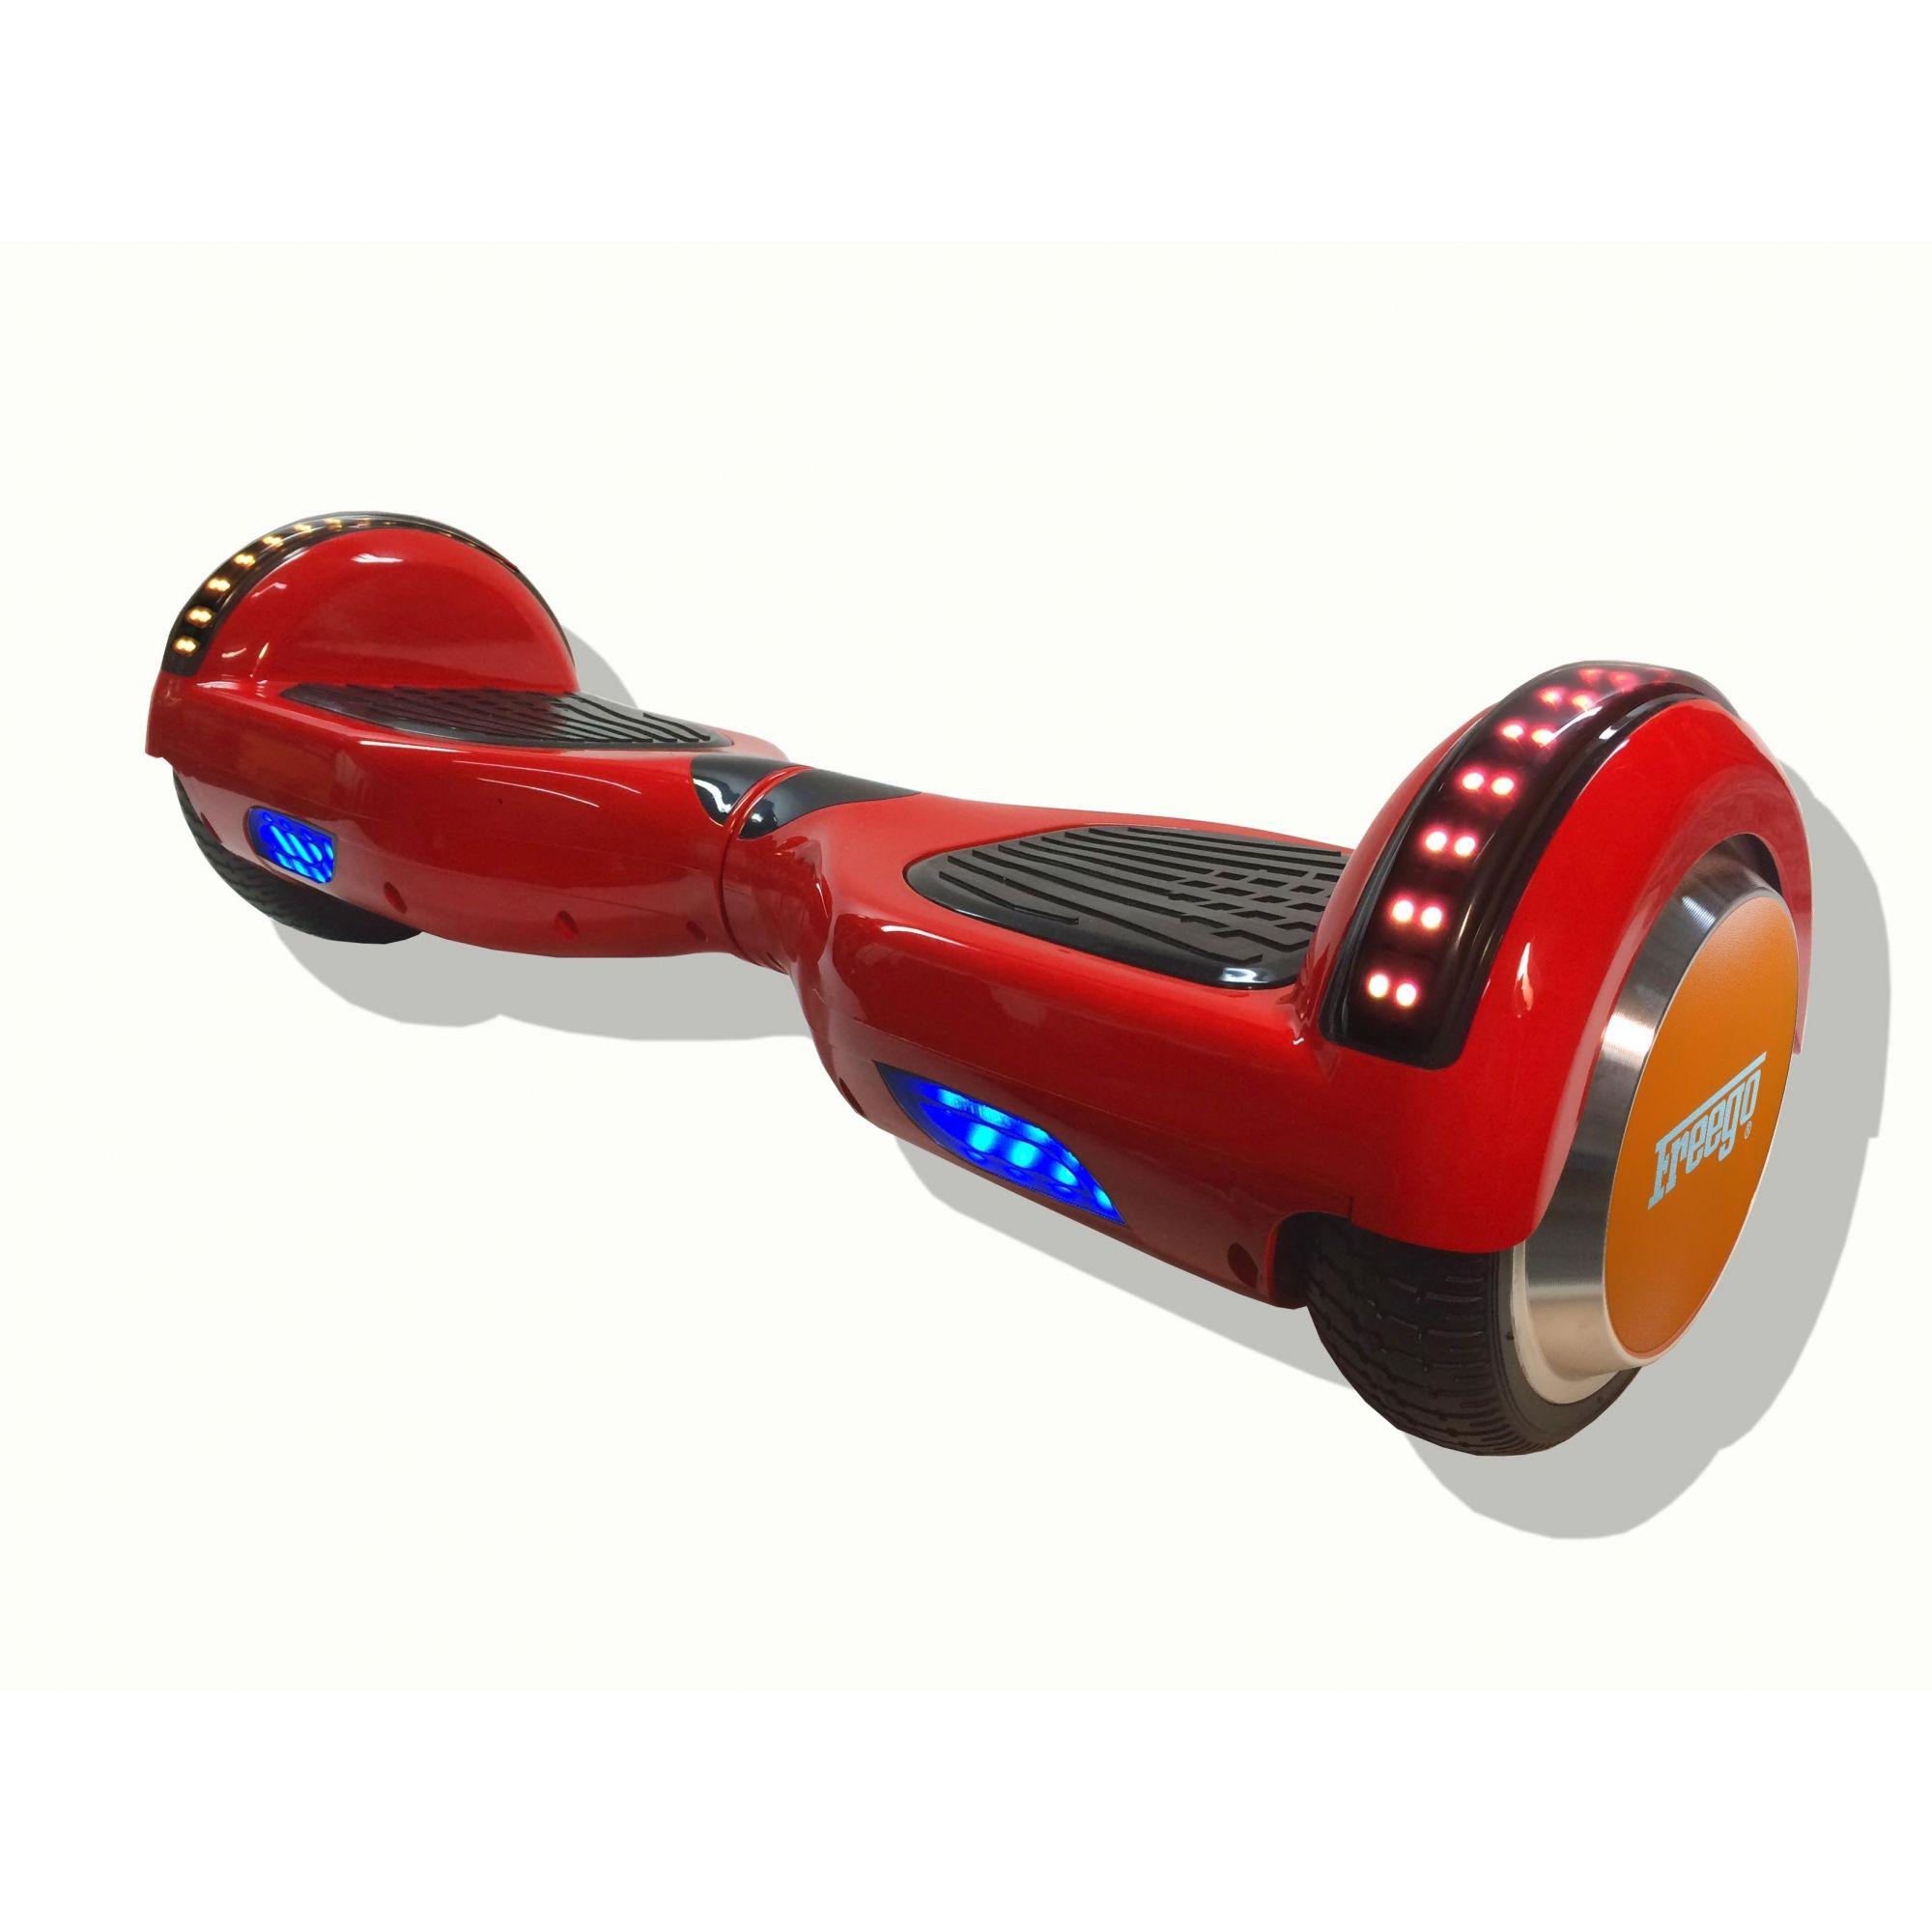 Vermelho FERRARI  - Hoverboard FREEGO -  modelo  2018